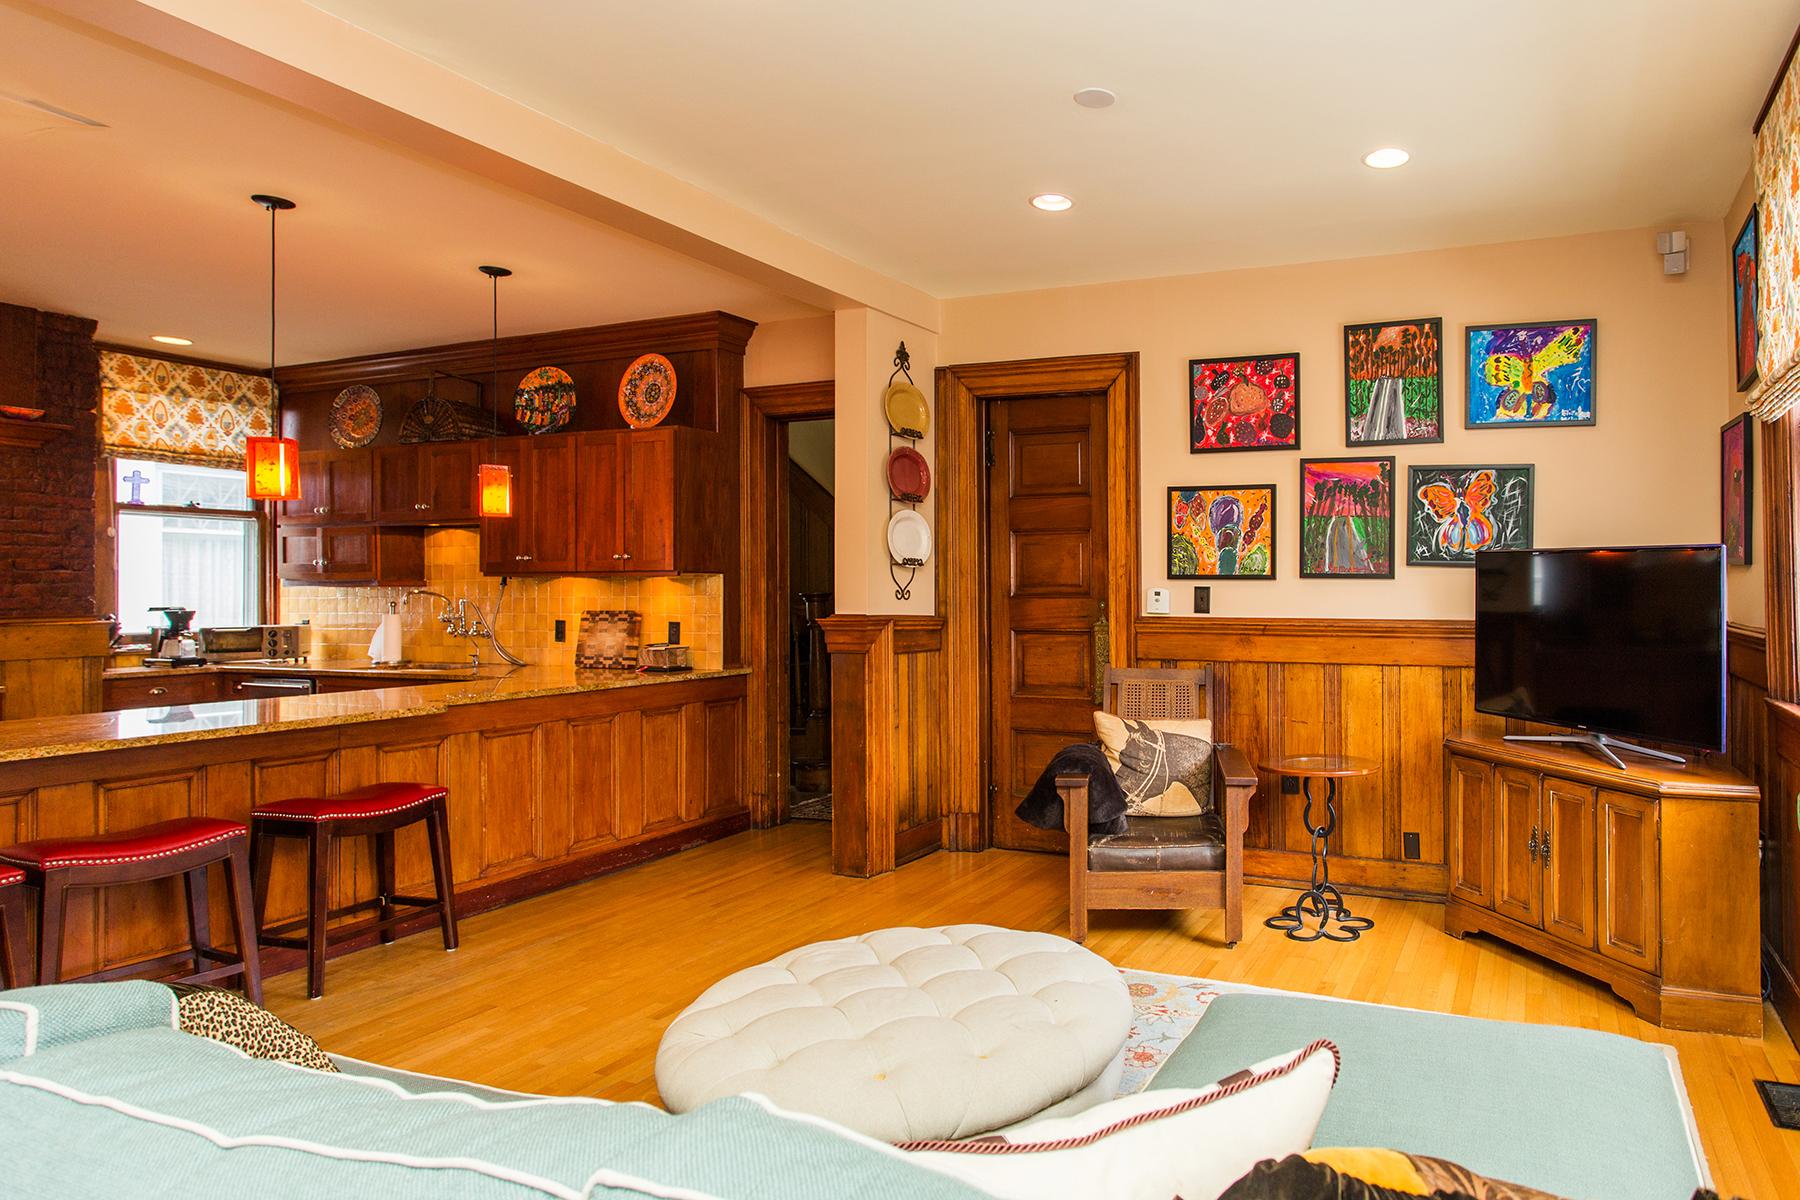 Additional photo for property listing at Downtown Saratoga Victorian Mansion 115  Circular St Saratoga Springs, Nueva York 12866 Estados Unidos